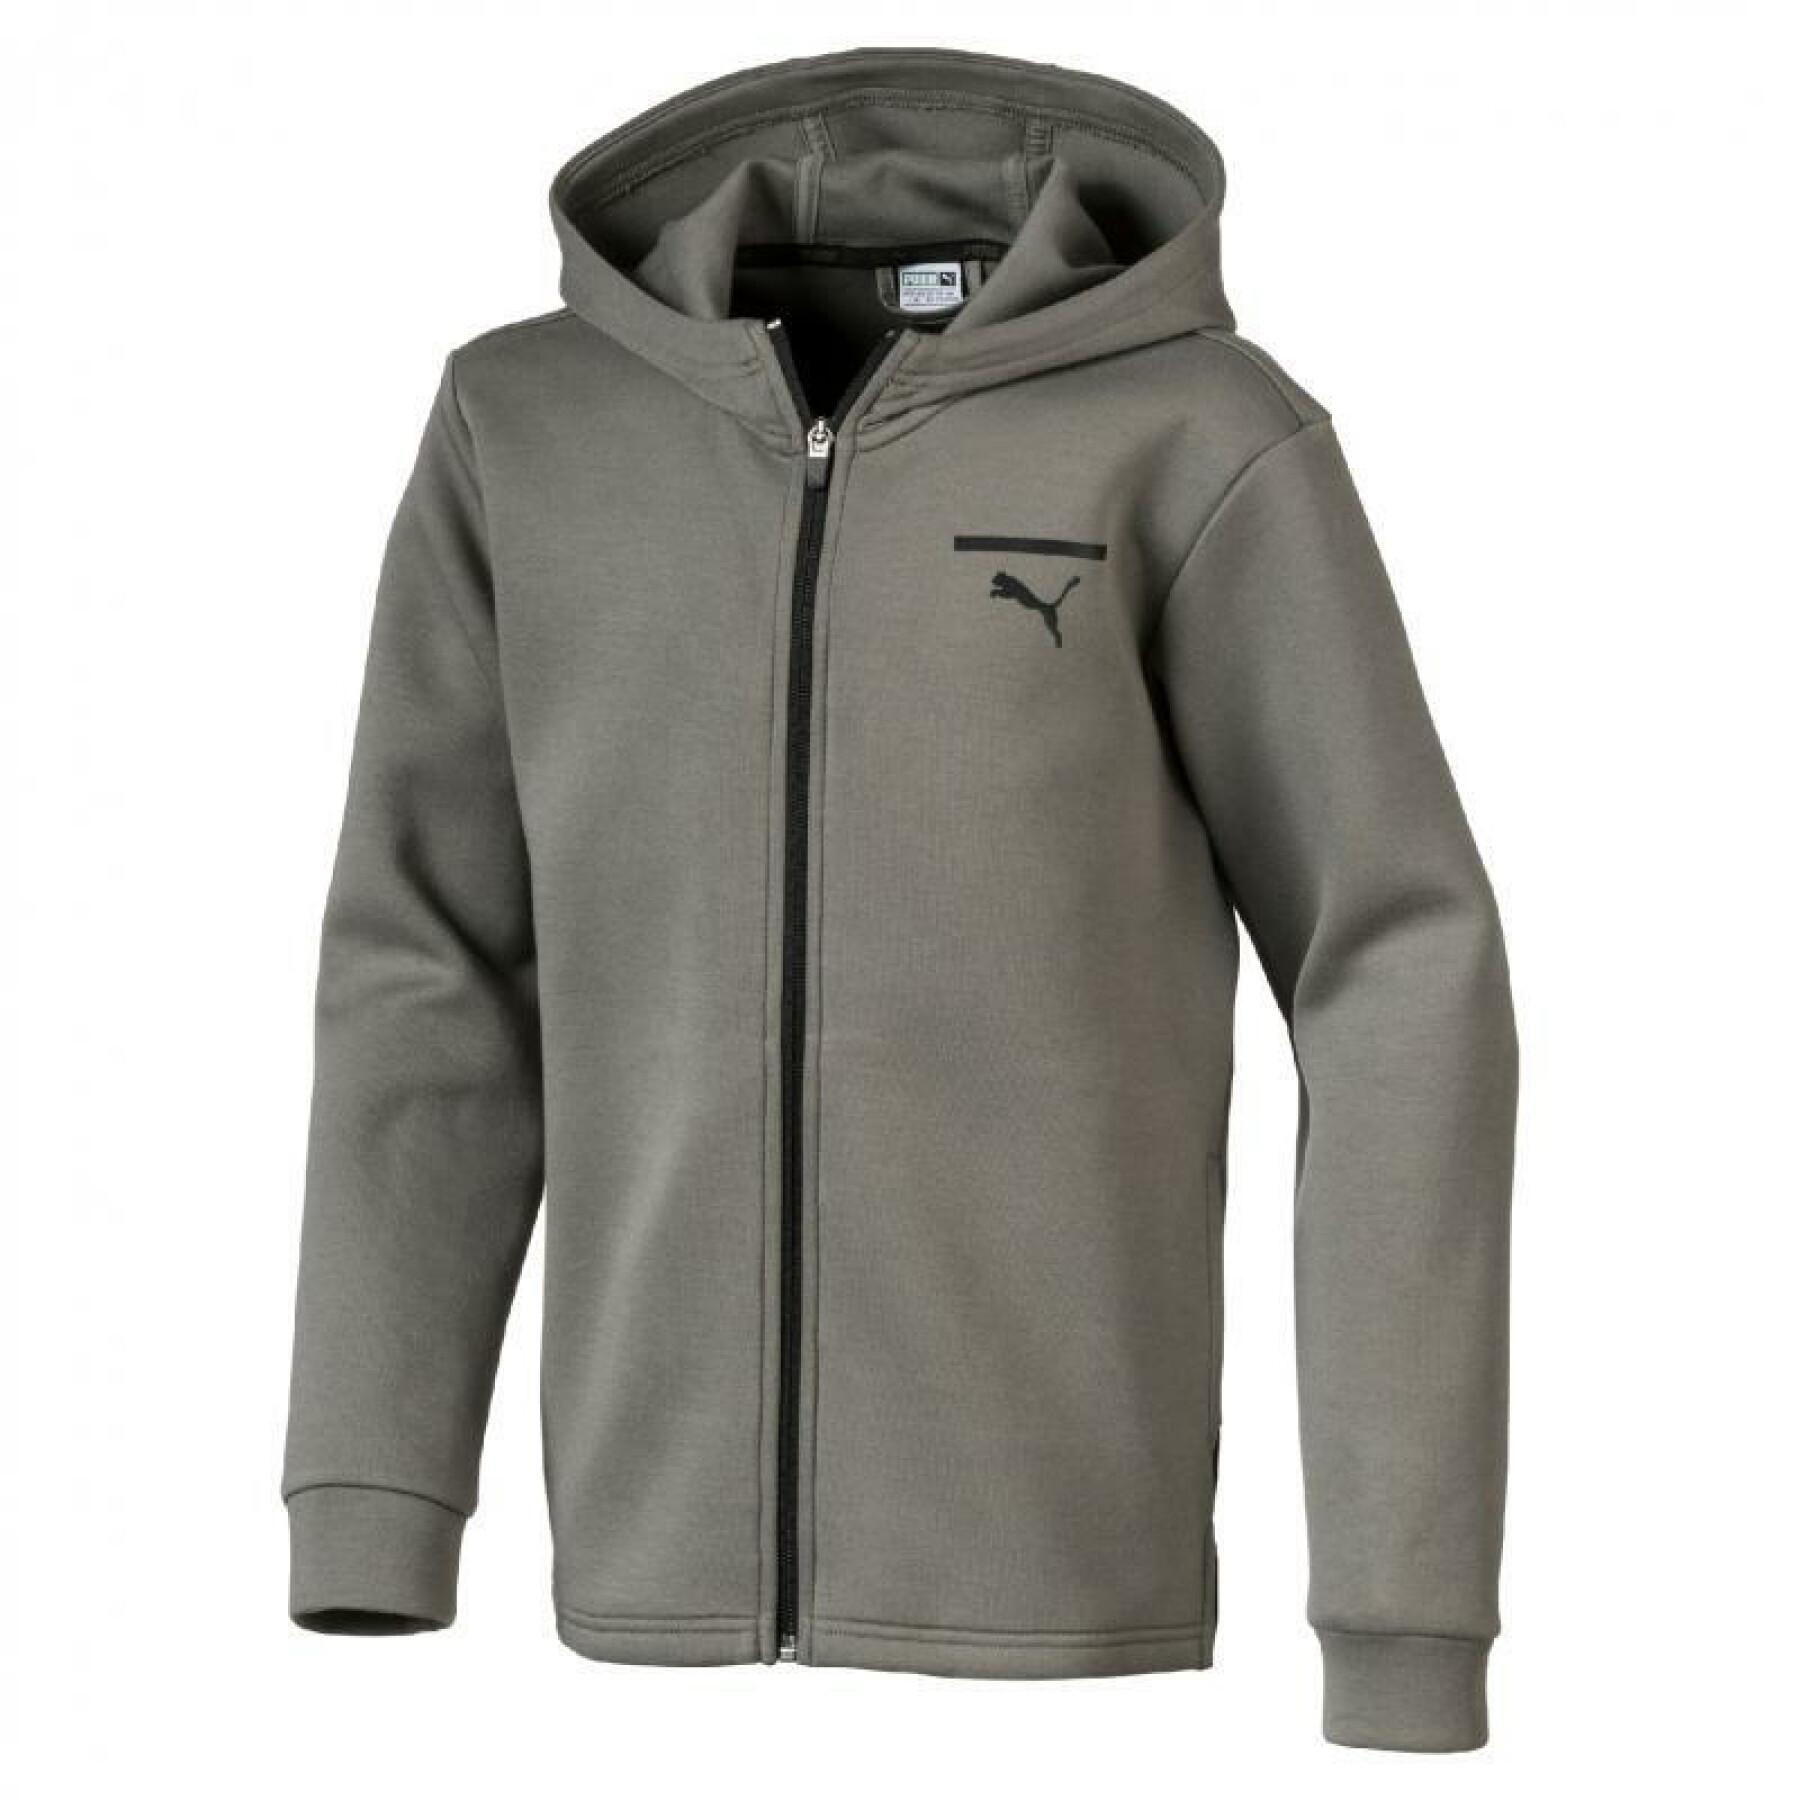 Children's jacket Puma Evostripe